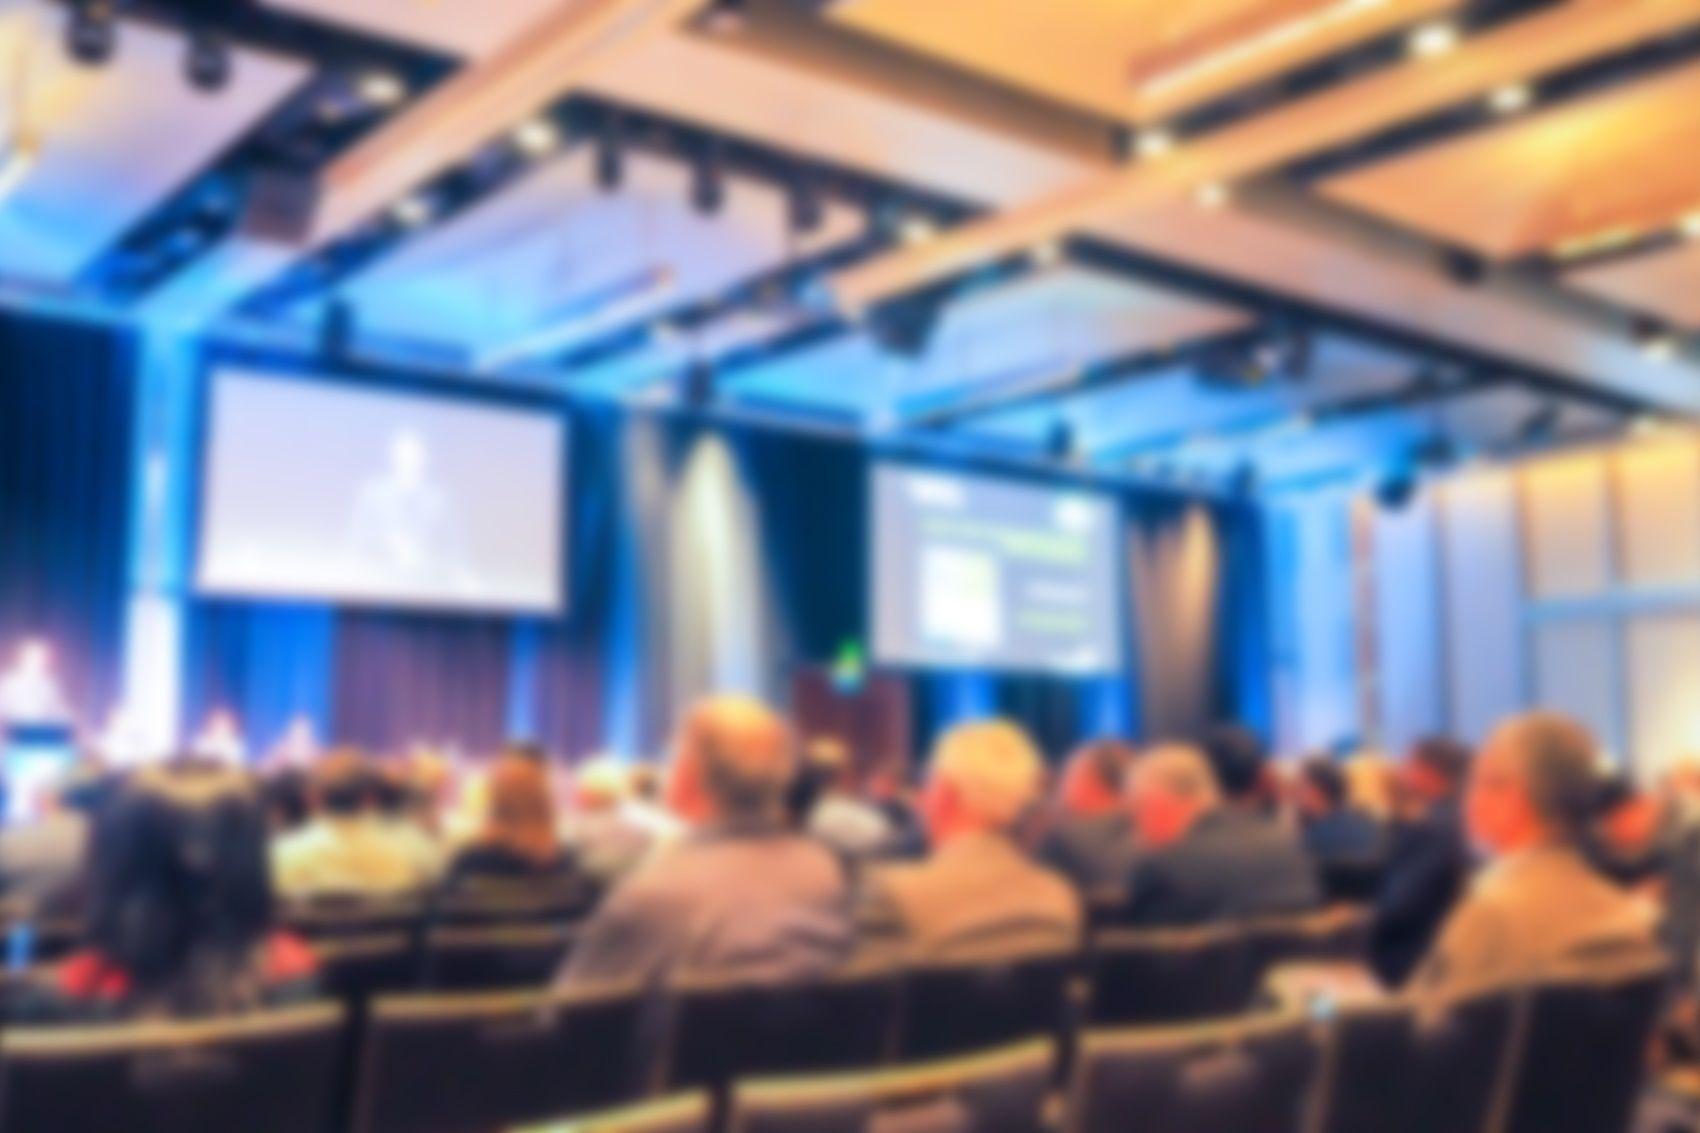 Congressos e eventos de Medicina - Outubro de 2021